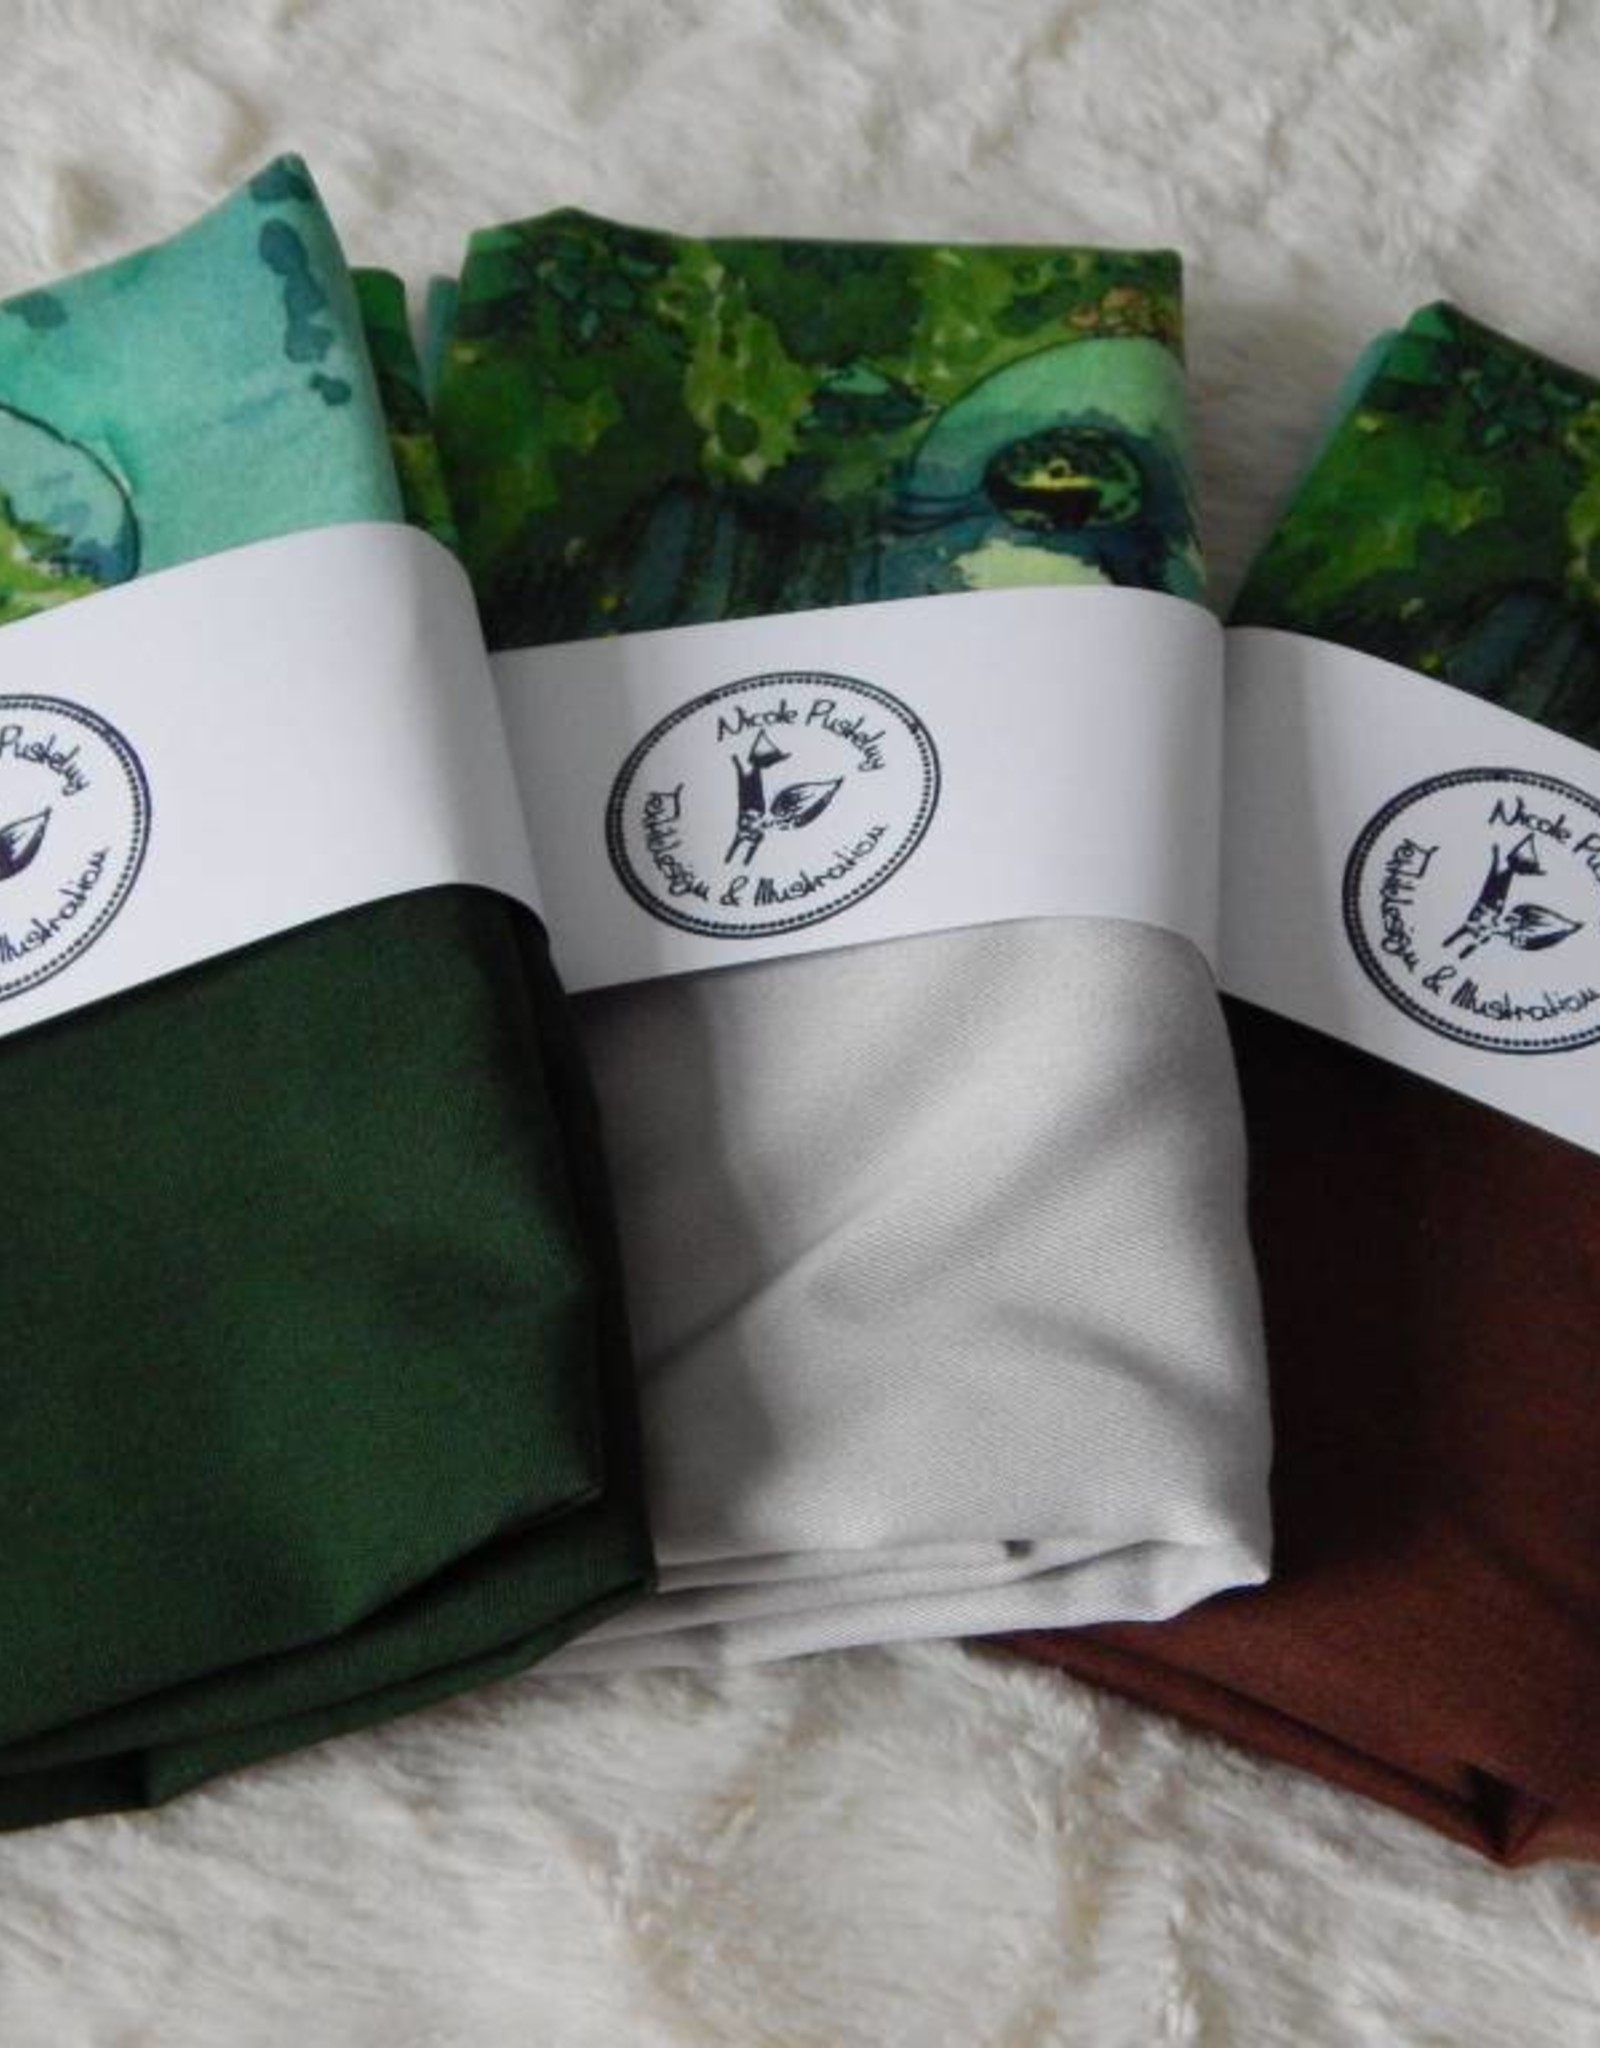 Nicole Pustelny Pillow Sheets, Octopus